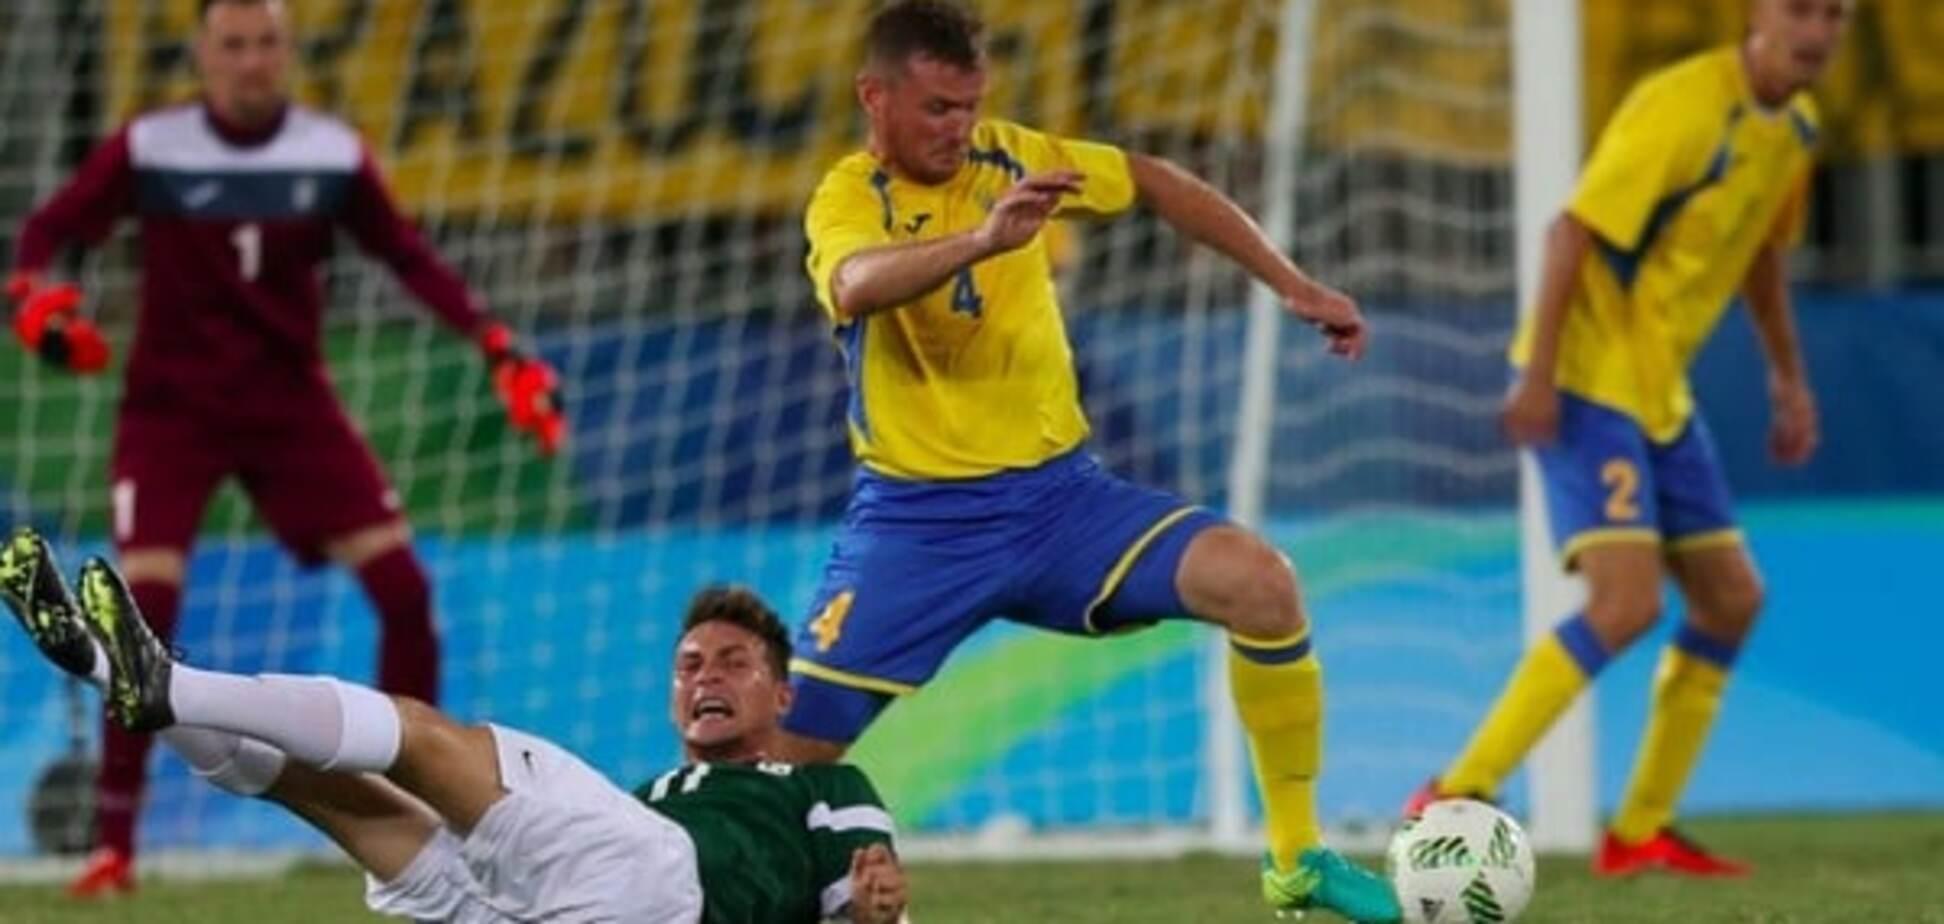 Збірна України з футболу стала чемпіоном Паралімпіади-2016